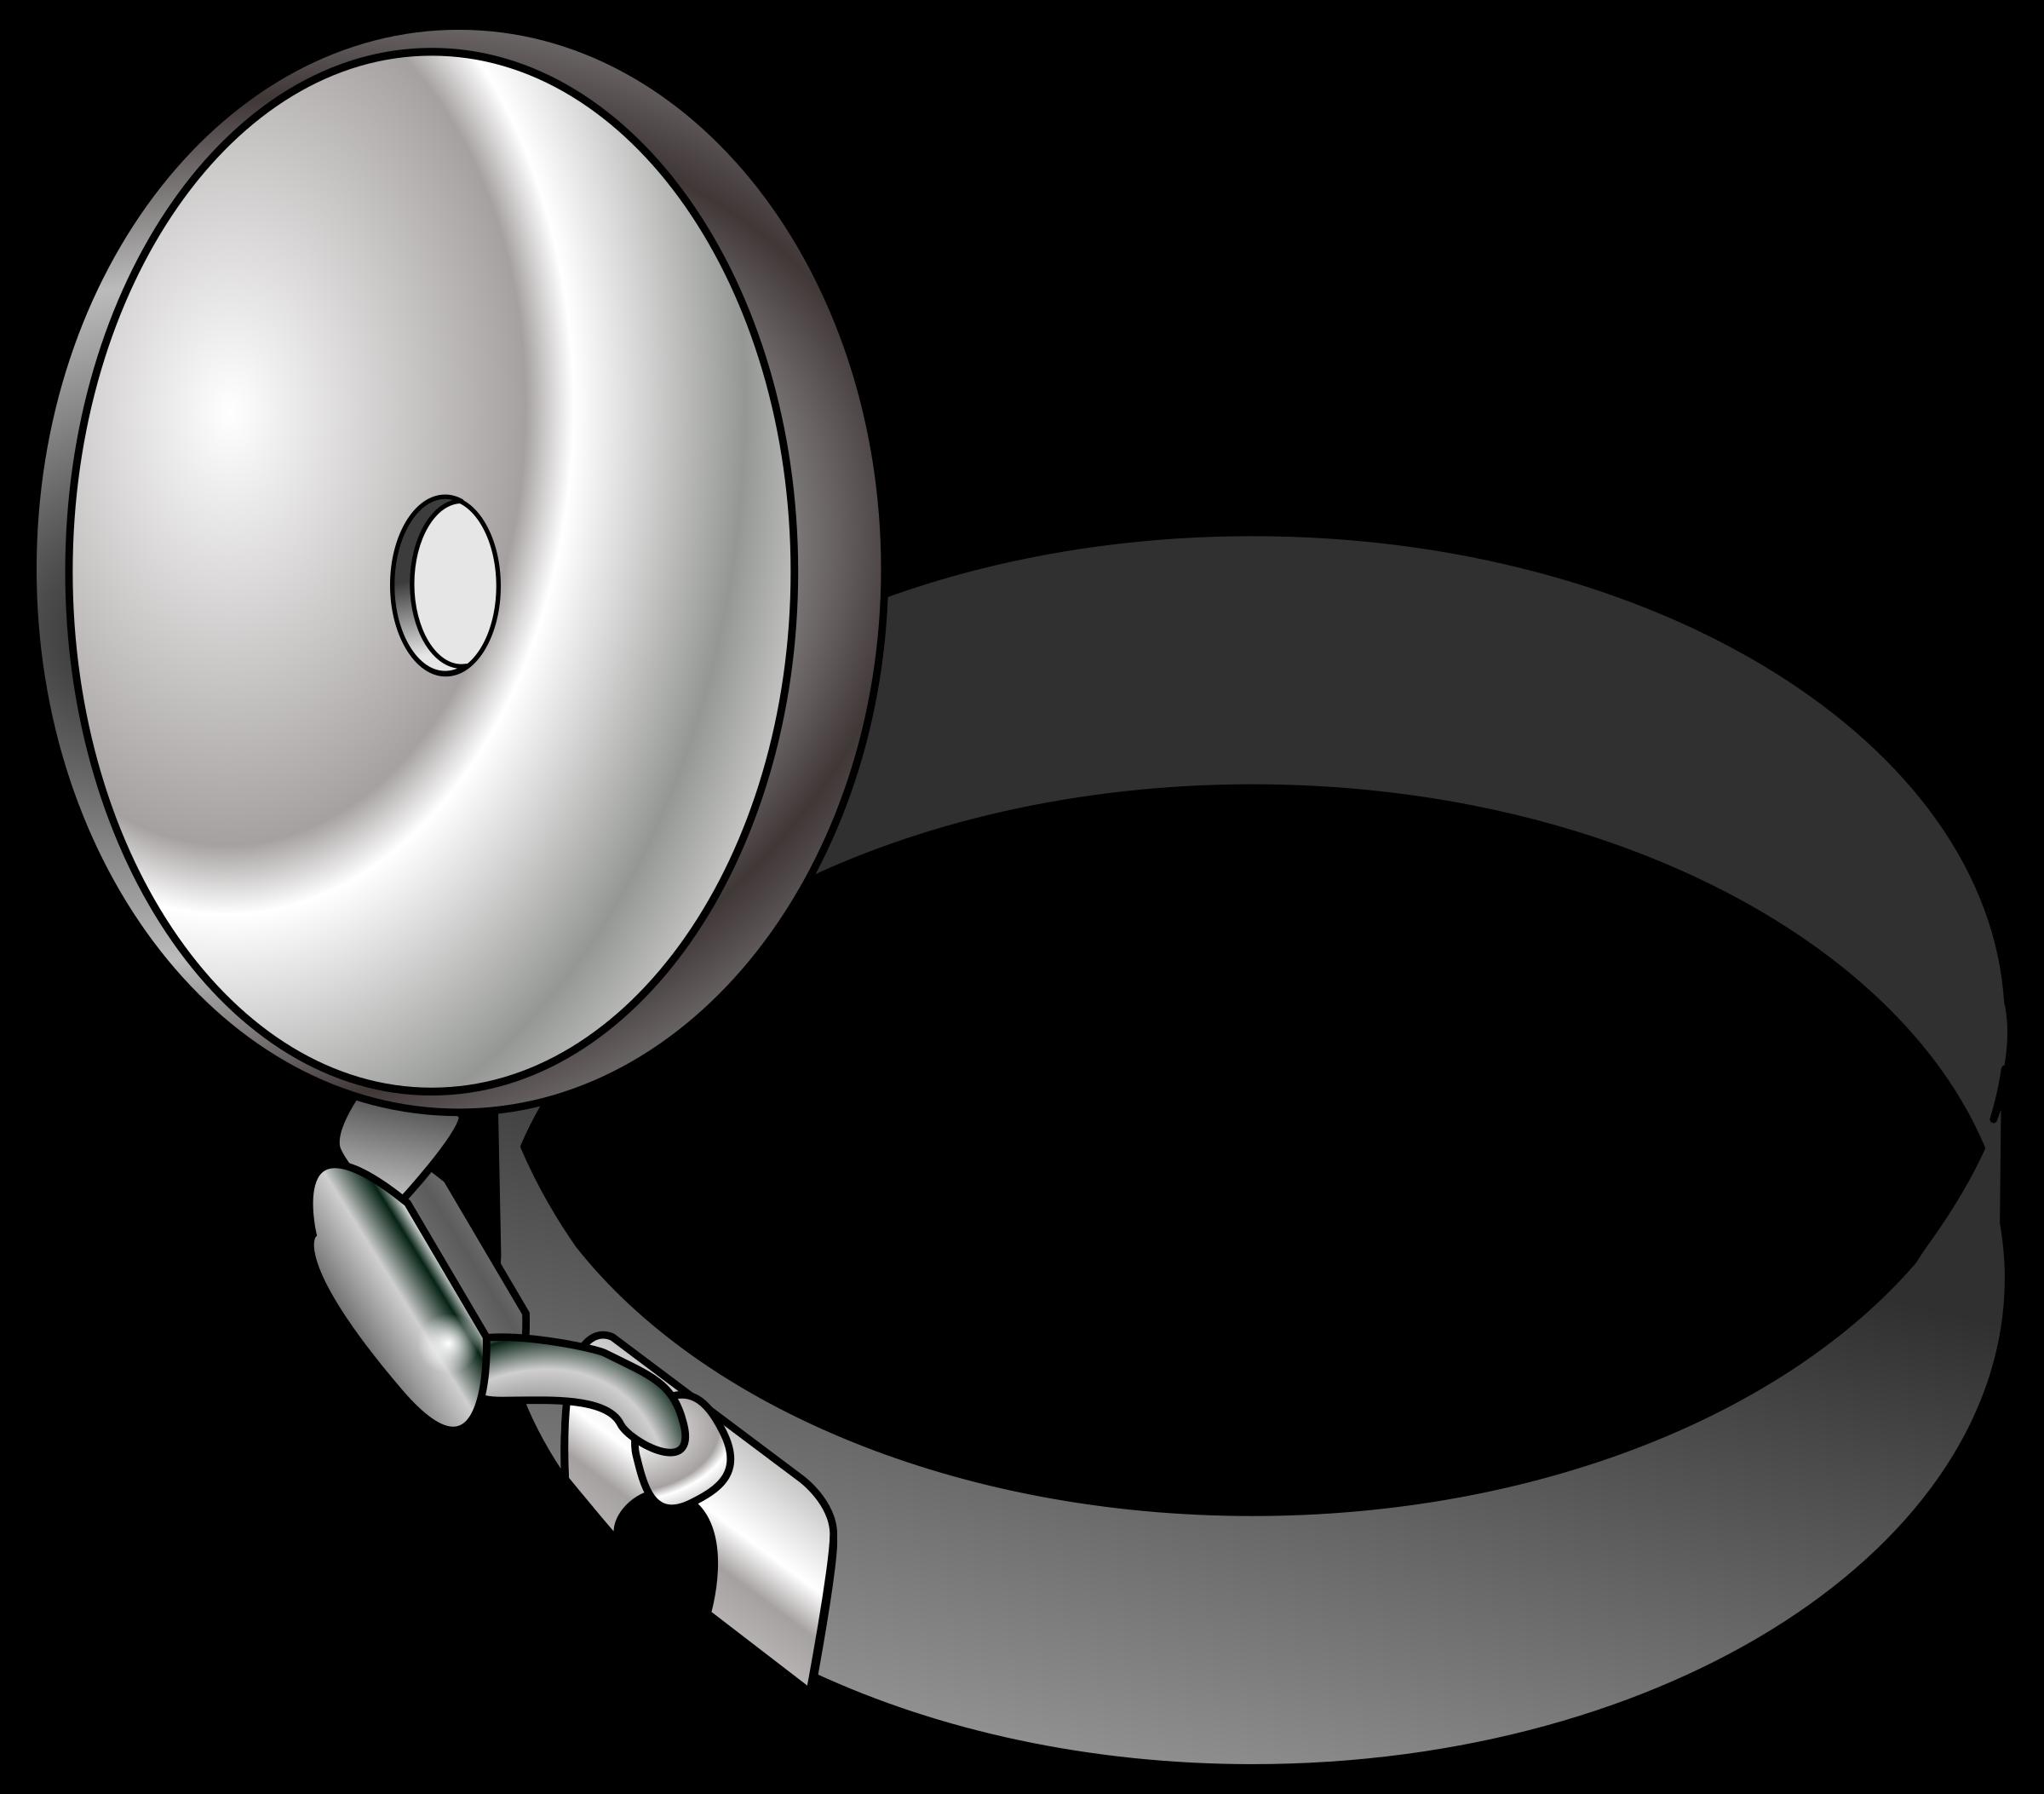 Doctor Head Mirror Clipart.